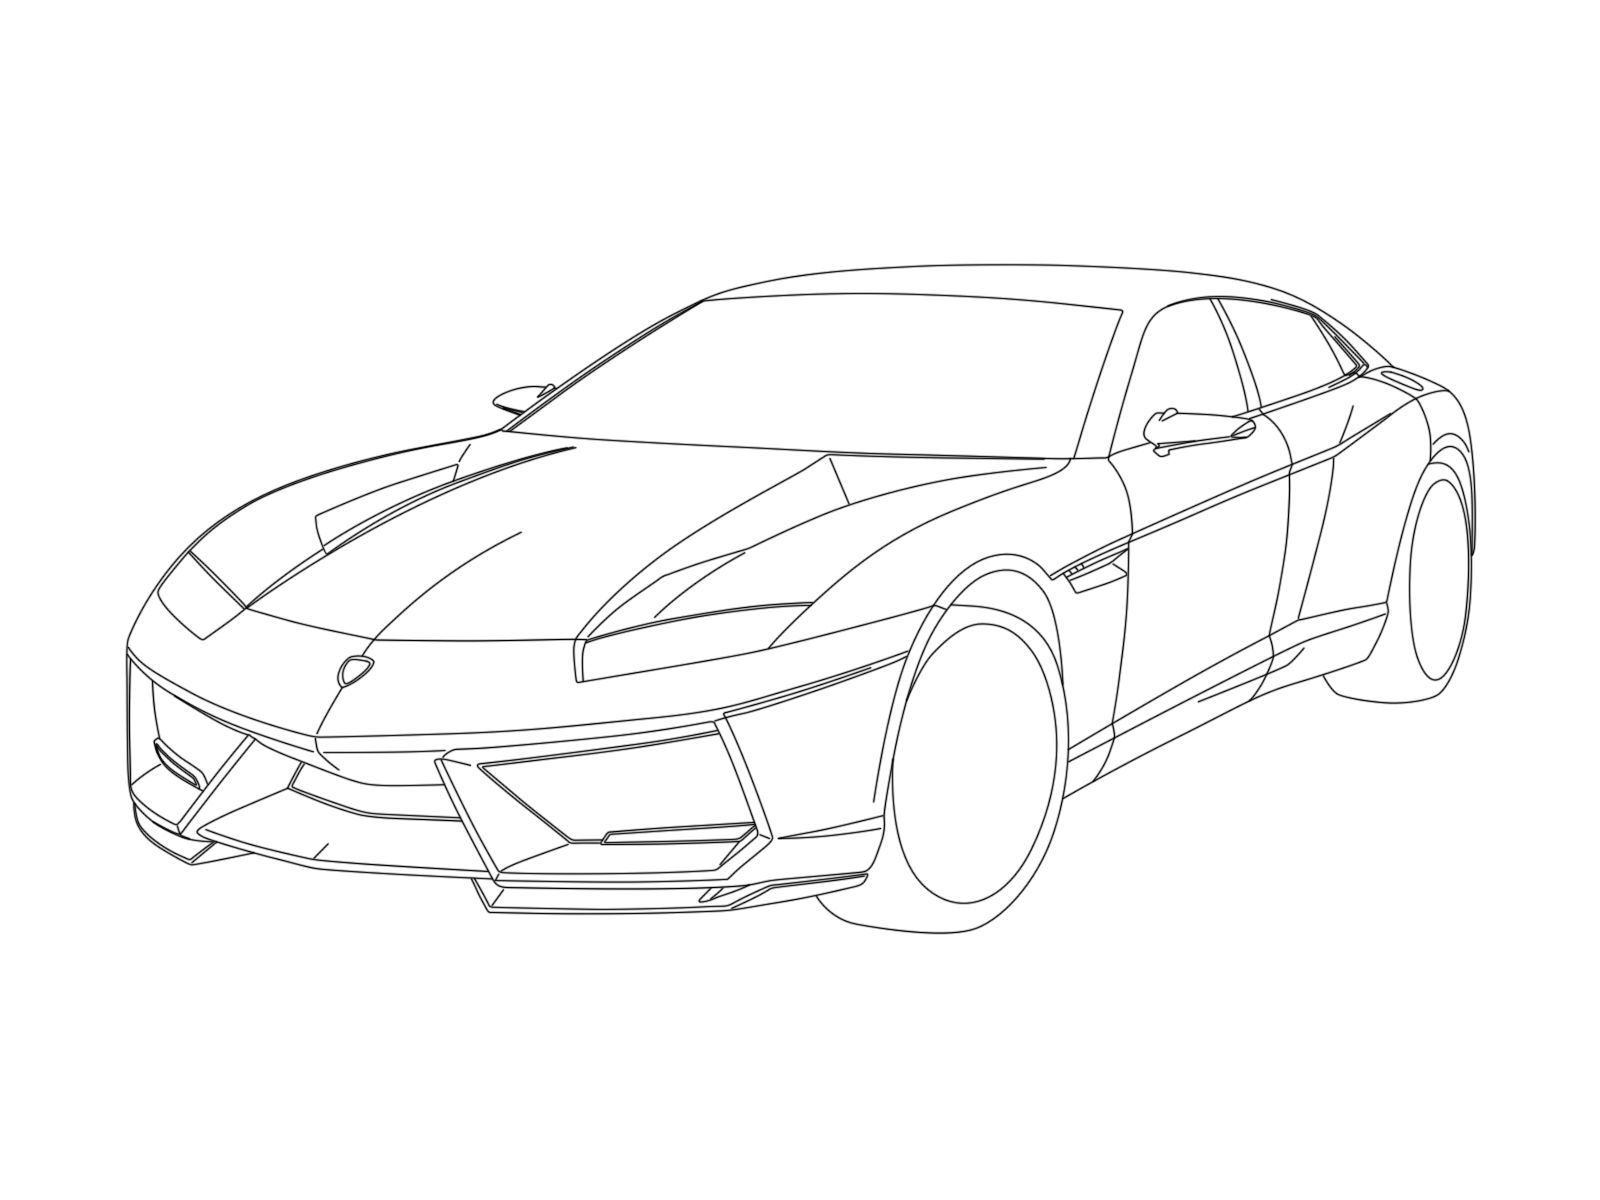 Lamborghini Veneno Drawing At Getdrawings Com Auto Electrical